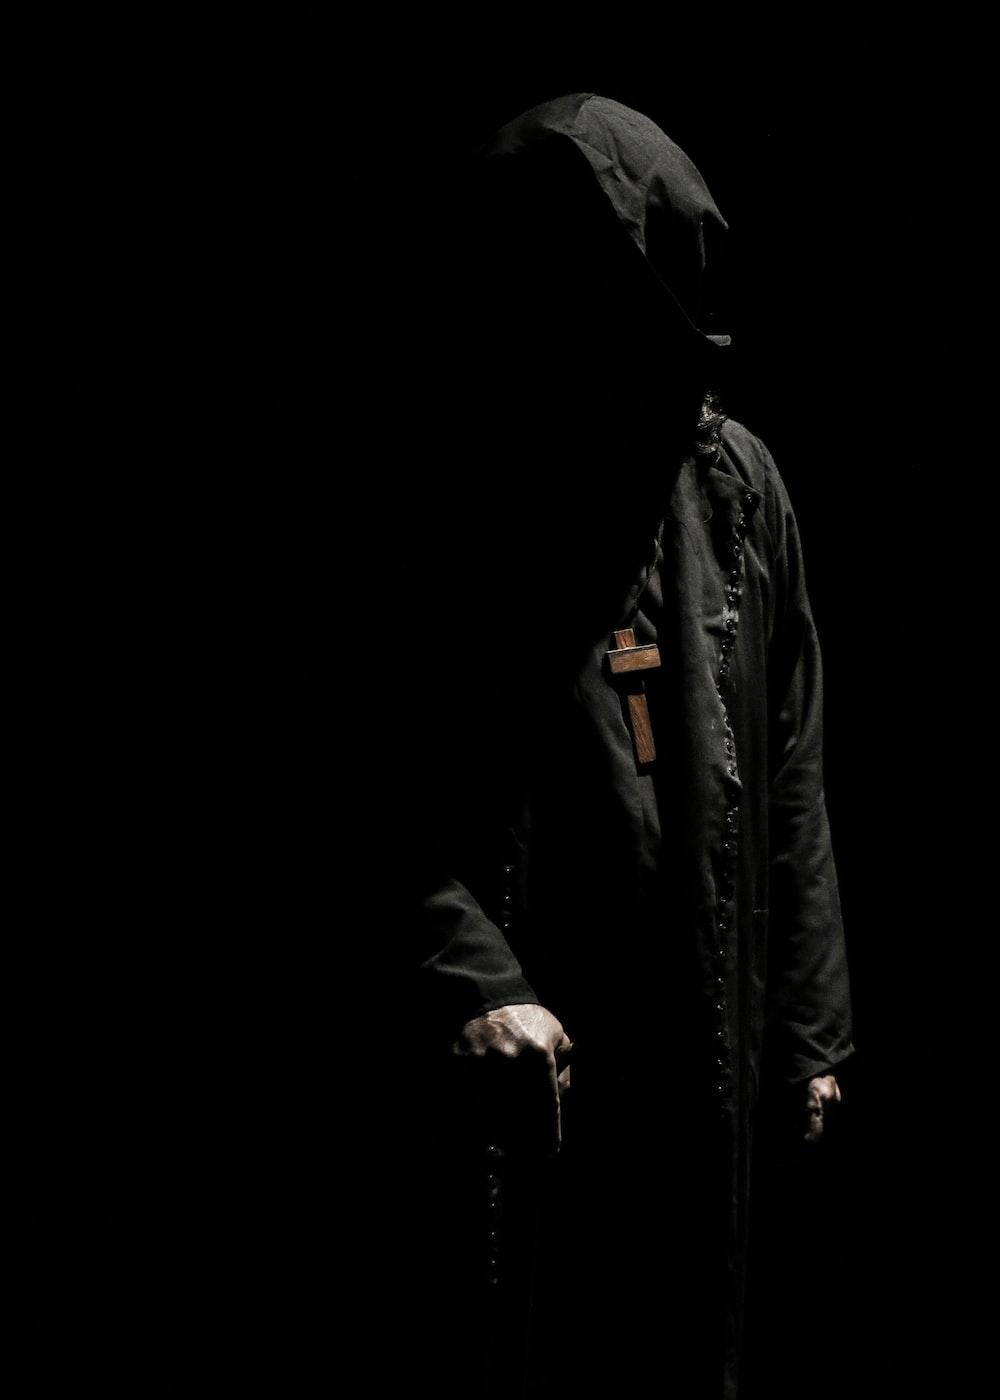 person wearing black jacket